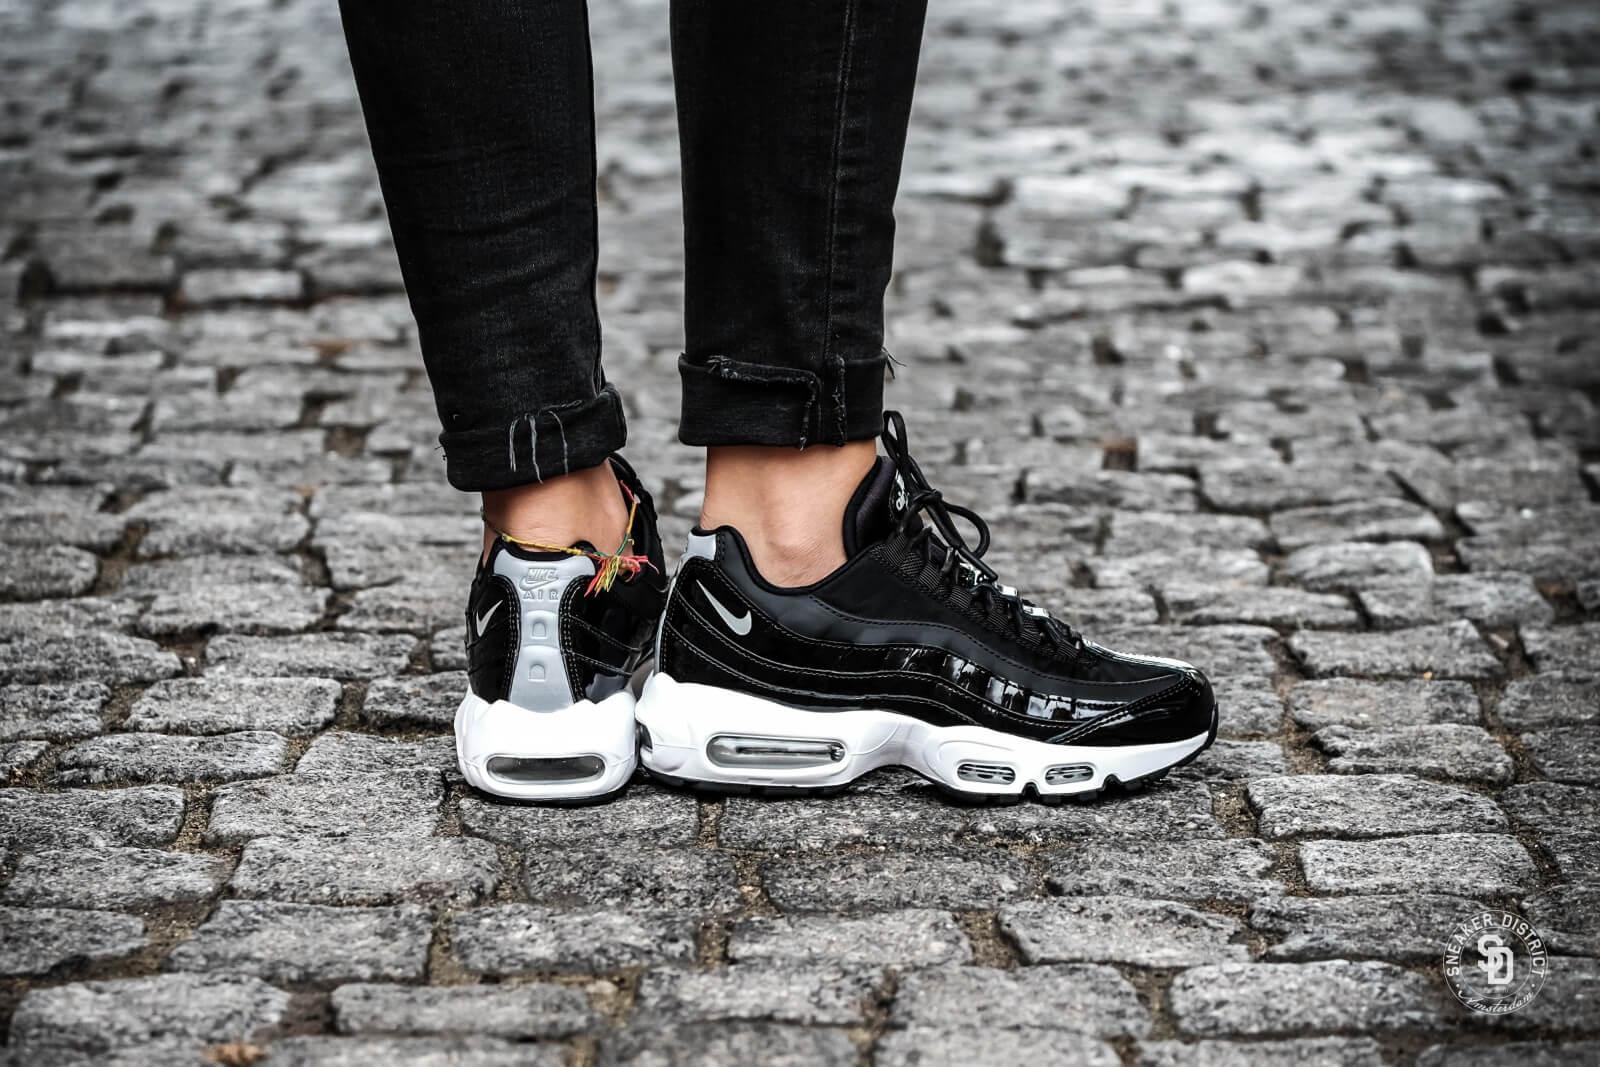 Nike Air Max 95 Sneakers BlackReflect SilverndBlackWhite